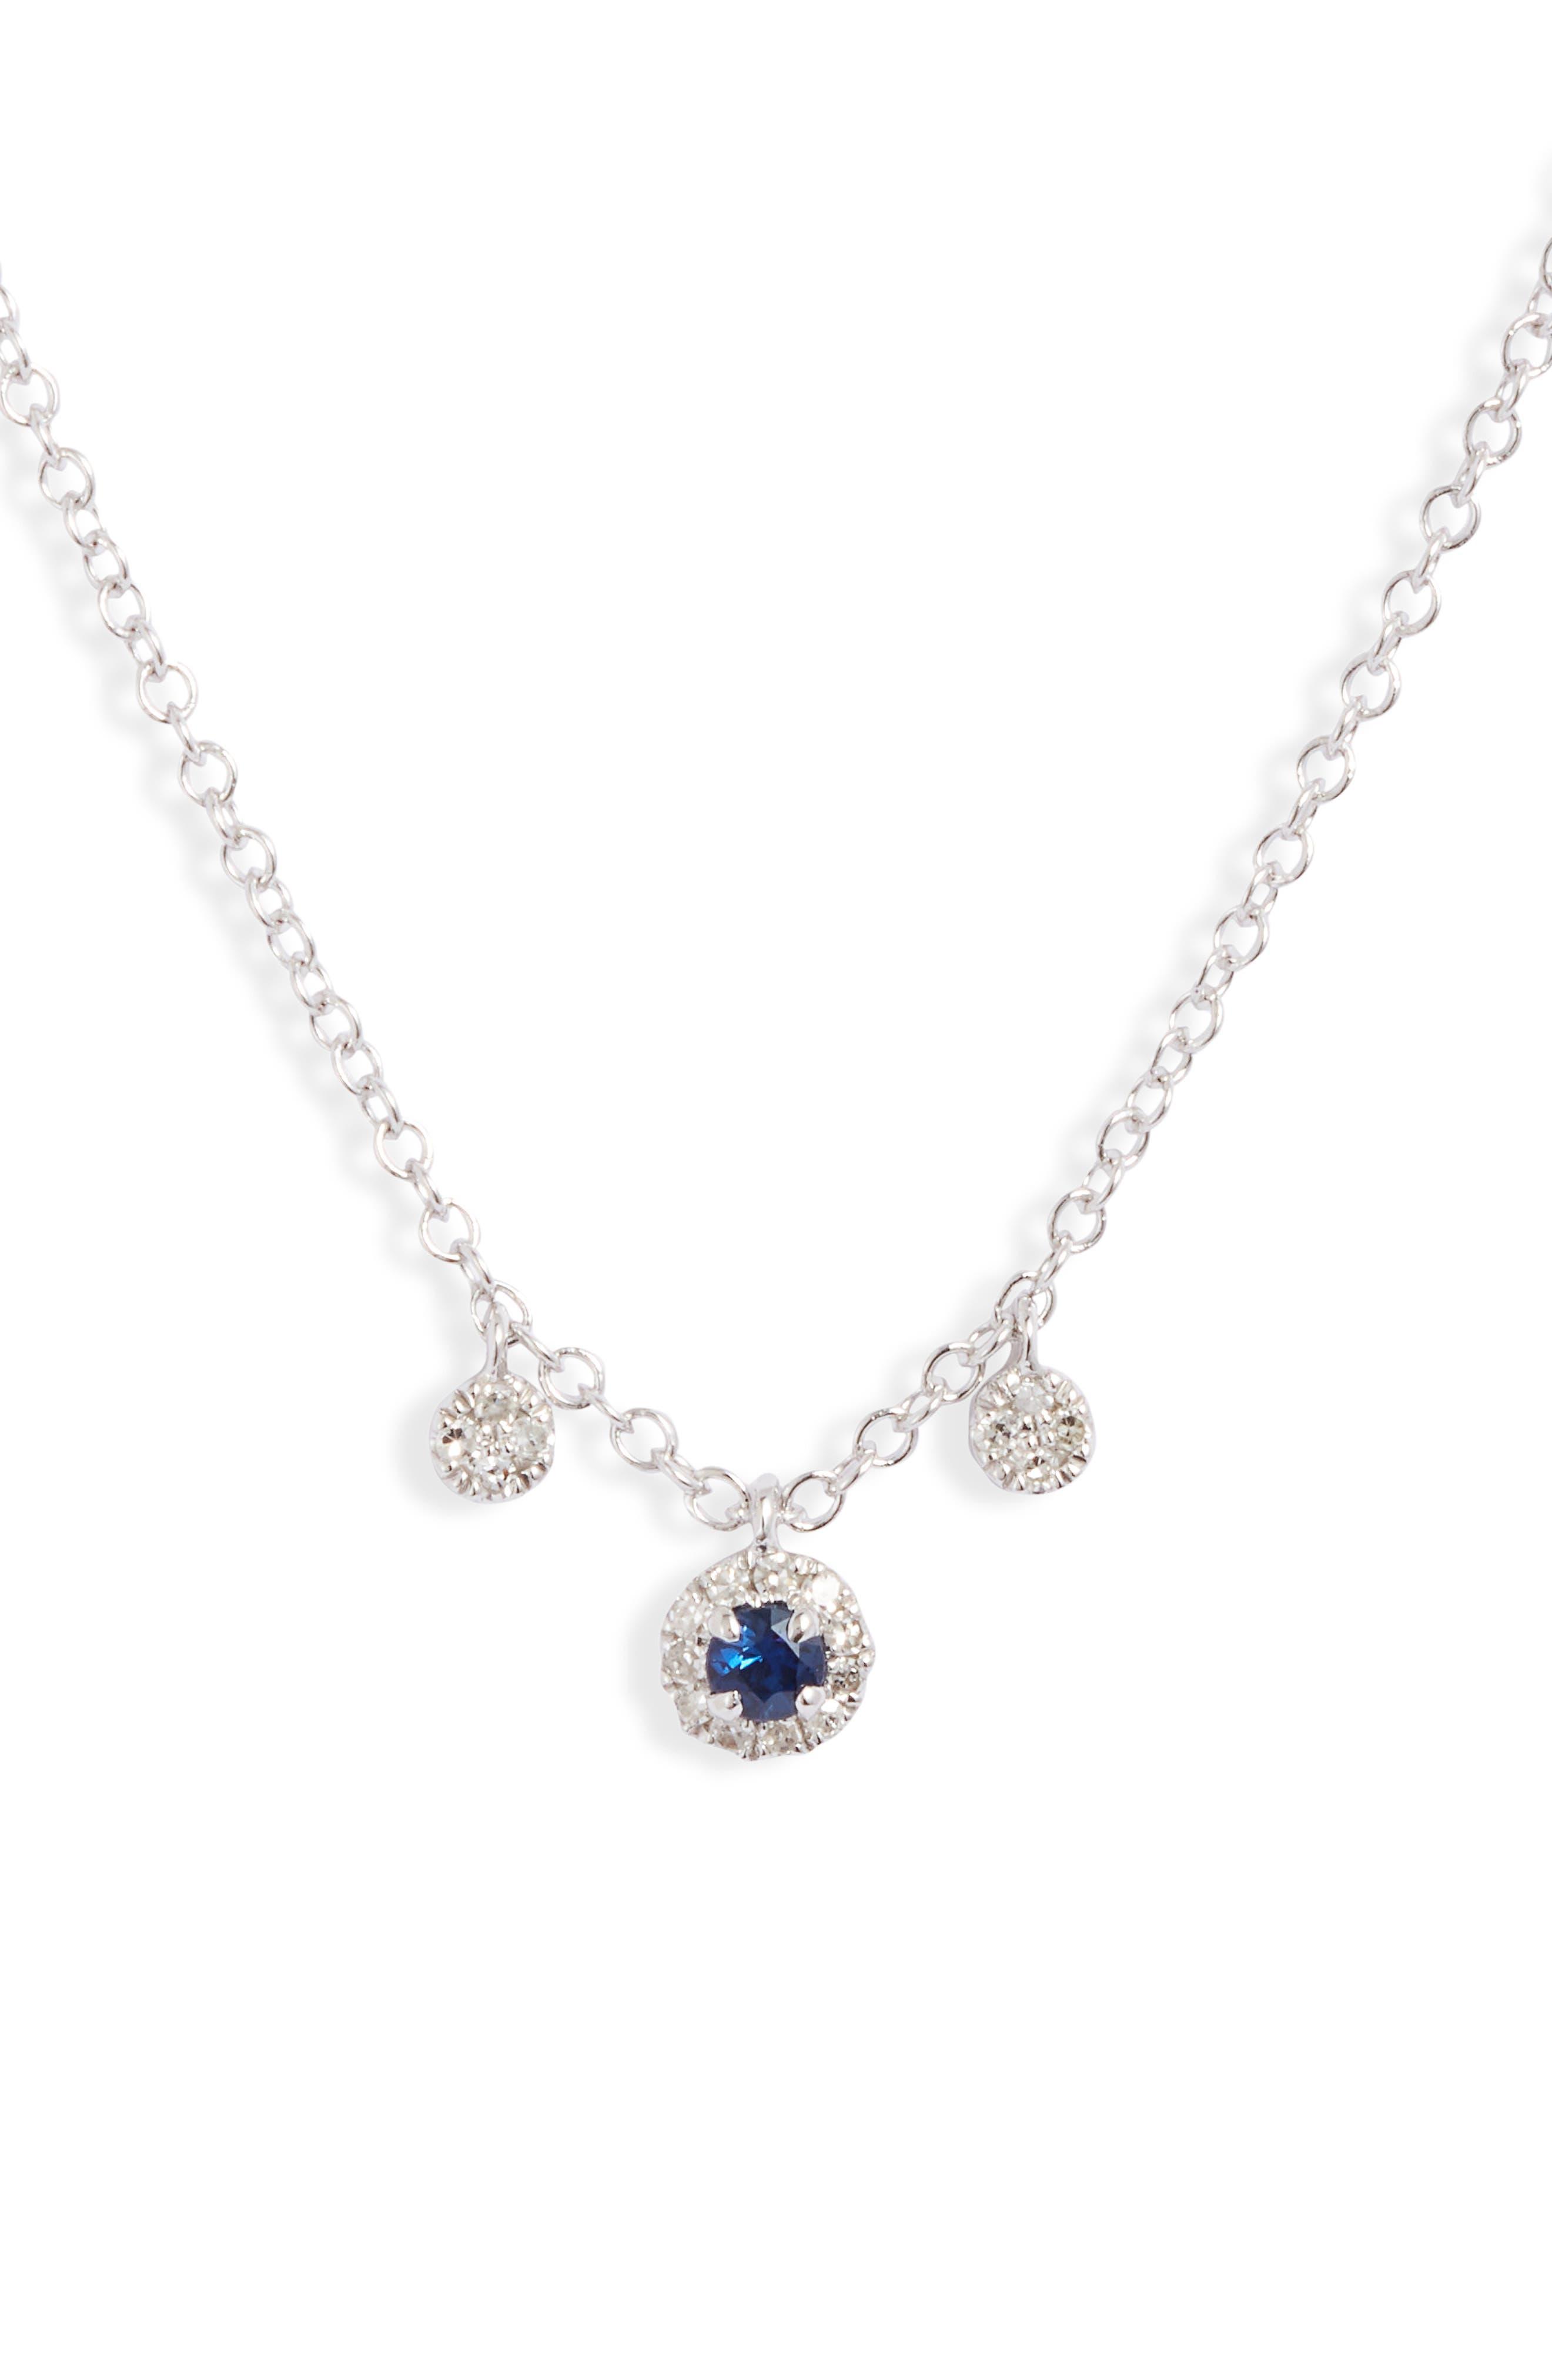 Blue Sapphire & Diamond Shaker Necklace